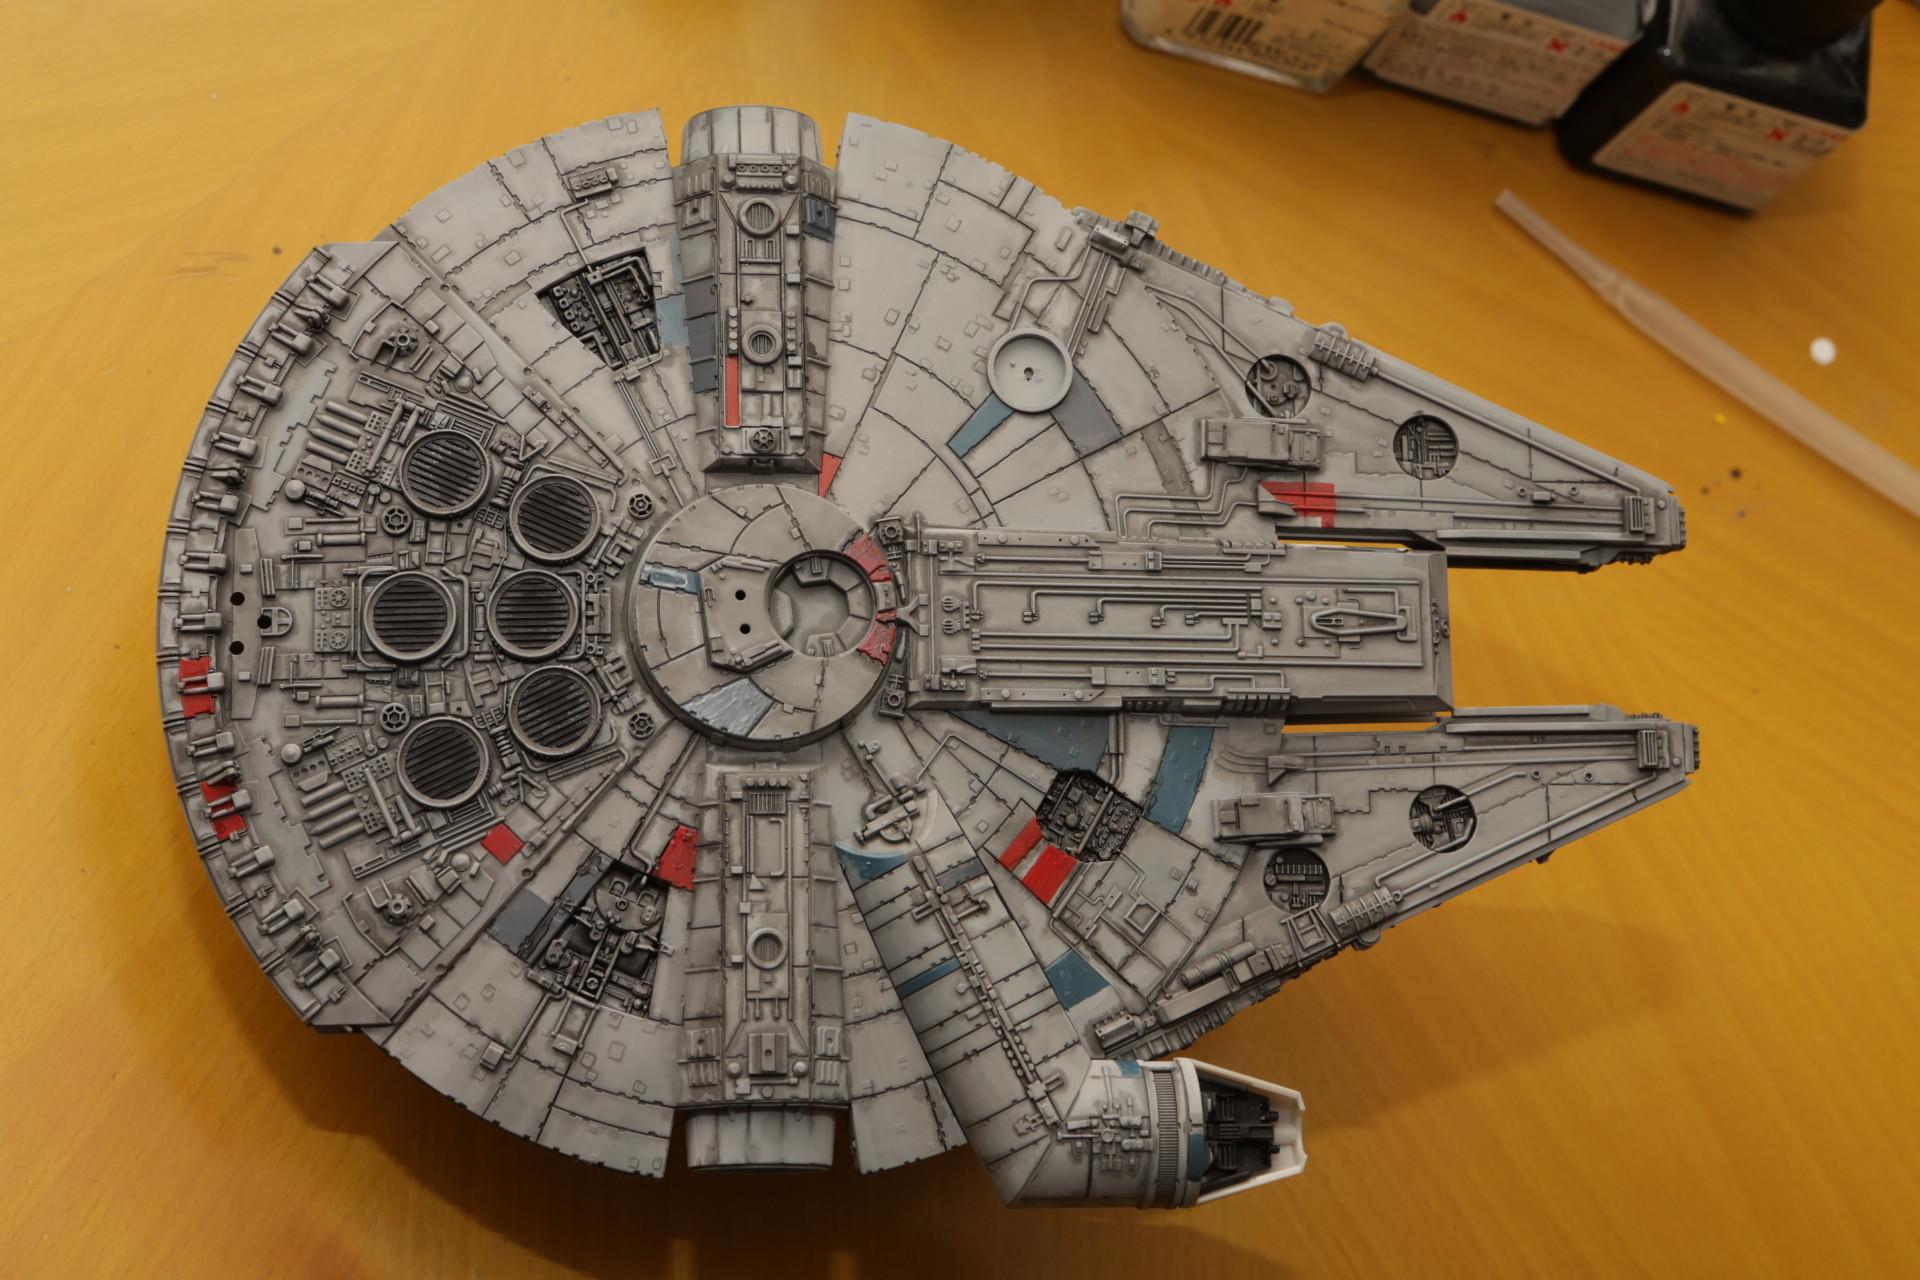 Star Wars Finemolds 1 144 Millennium Falcon Modeled By Royfocker22 Photoreview No 8 Wallpaper Size Images Gunjap